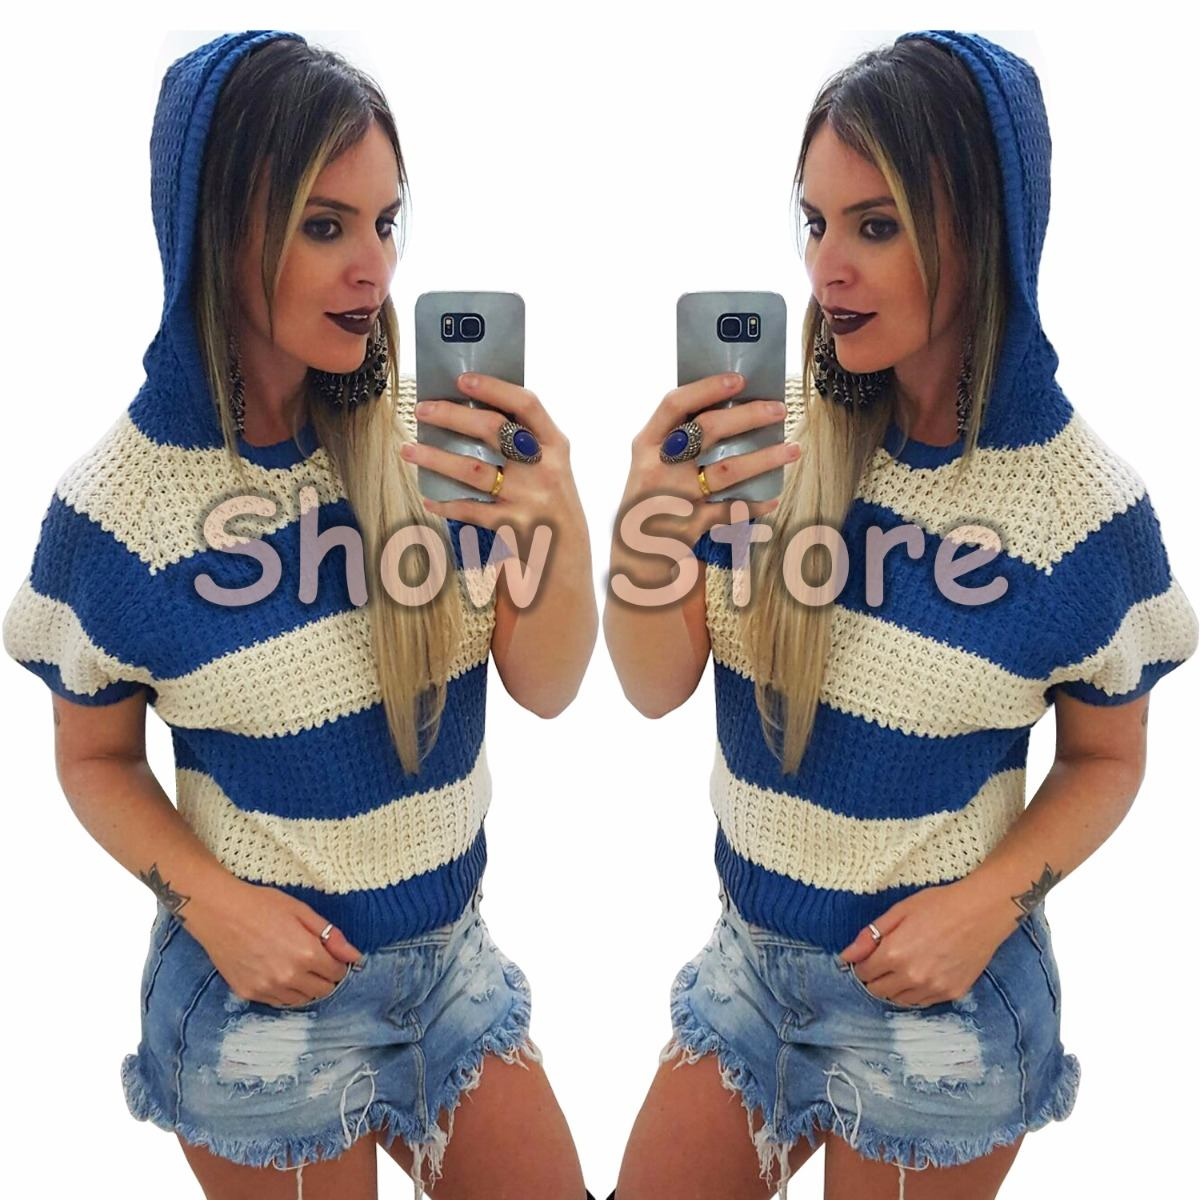 roupas femininas blusa de frio feminina estilo colete 2793. Carregando zoom. 7ec4ccb7423